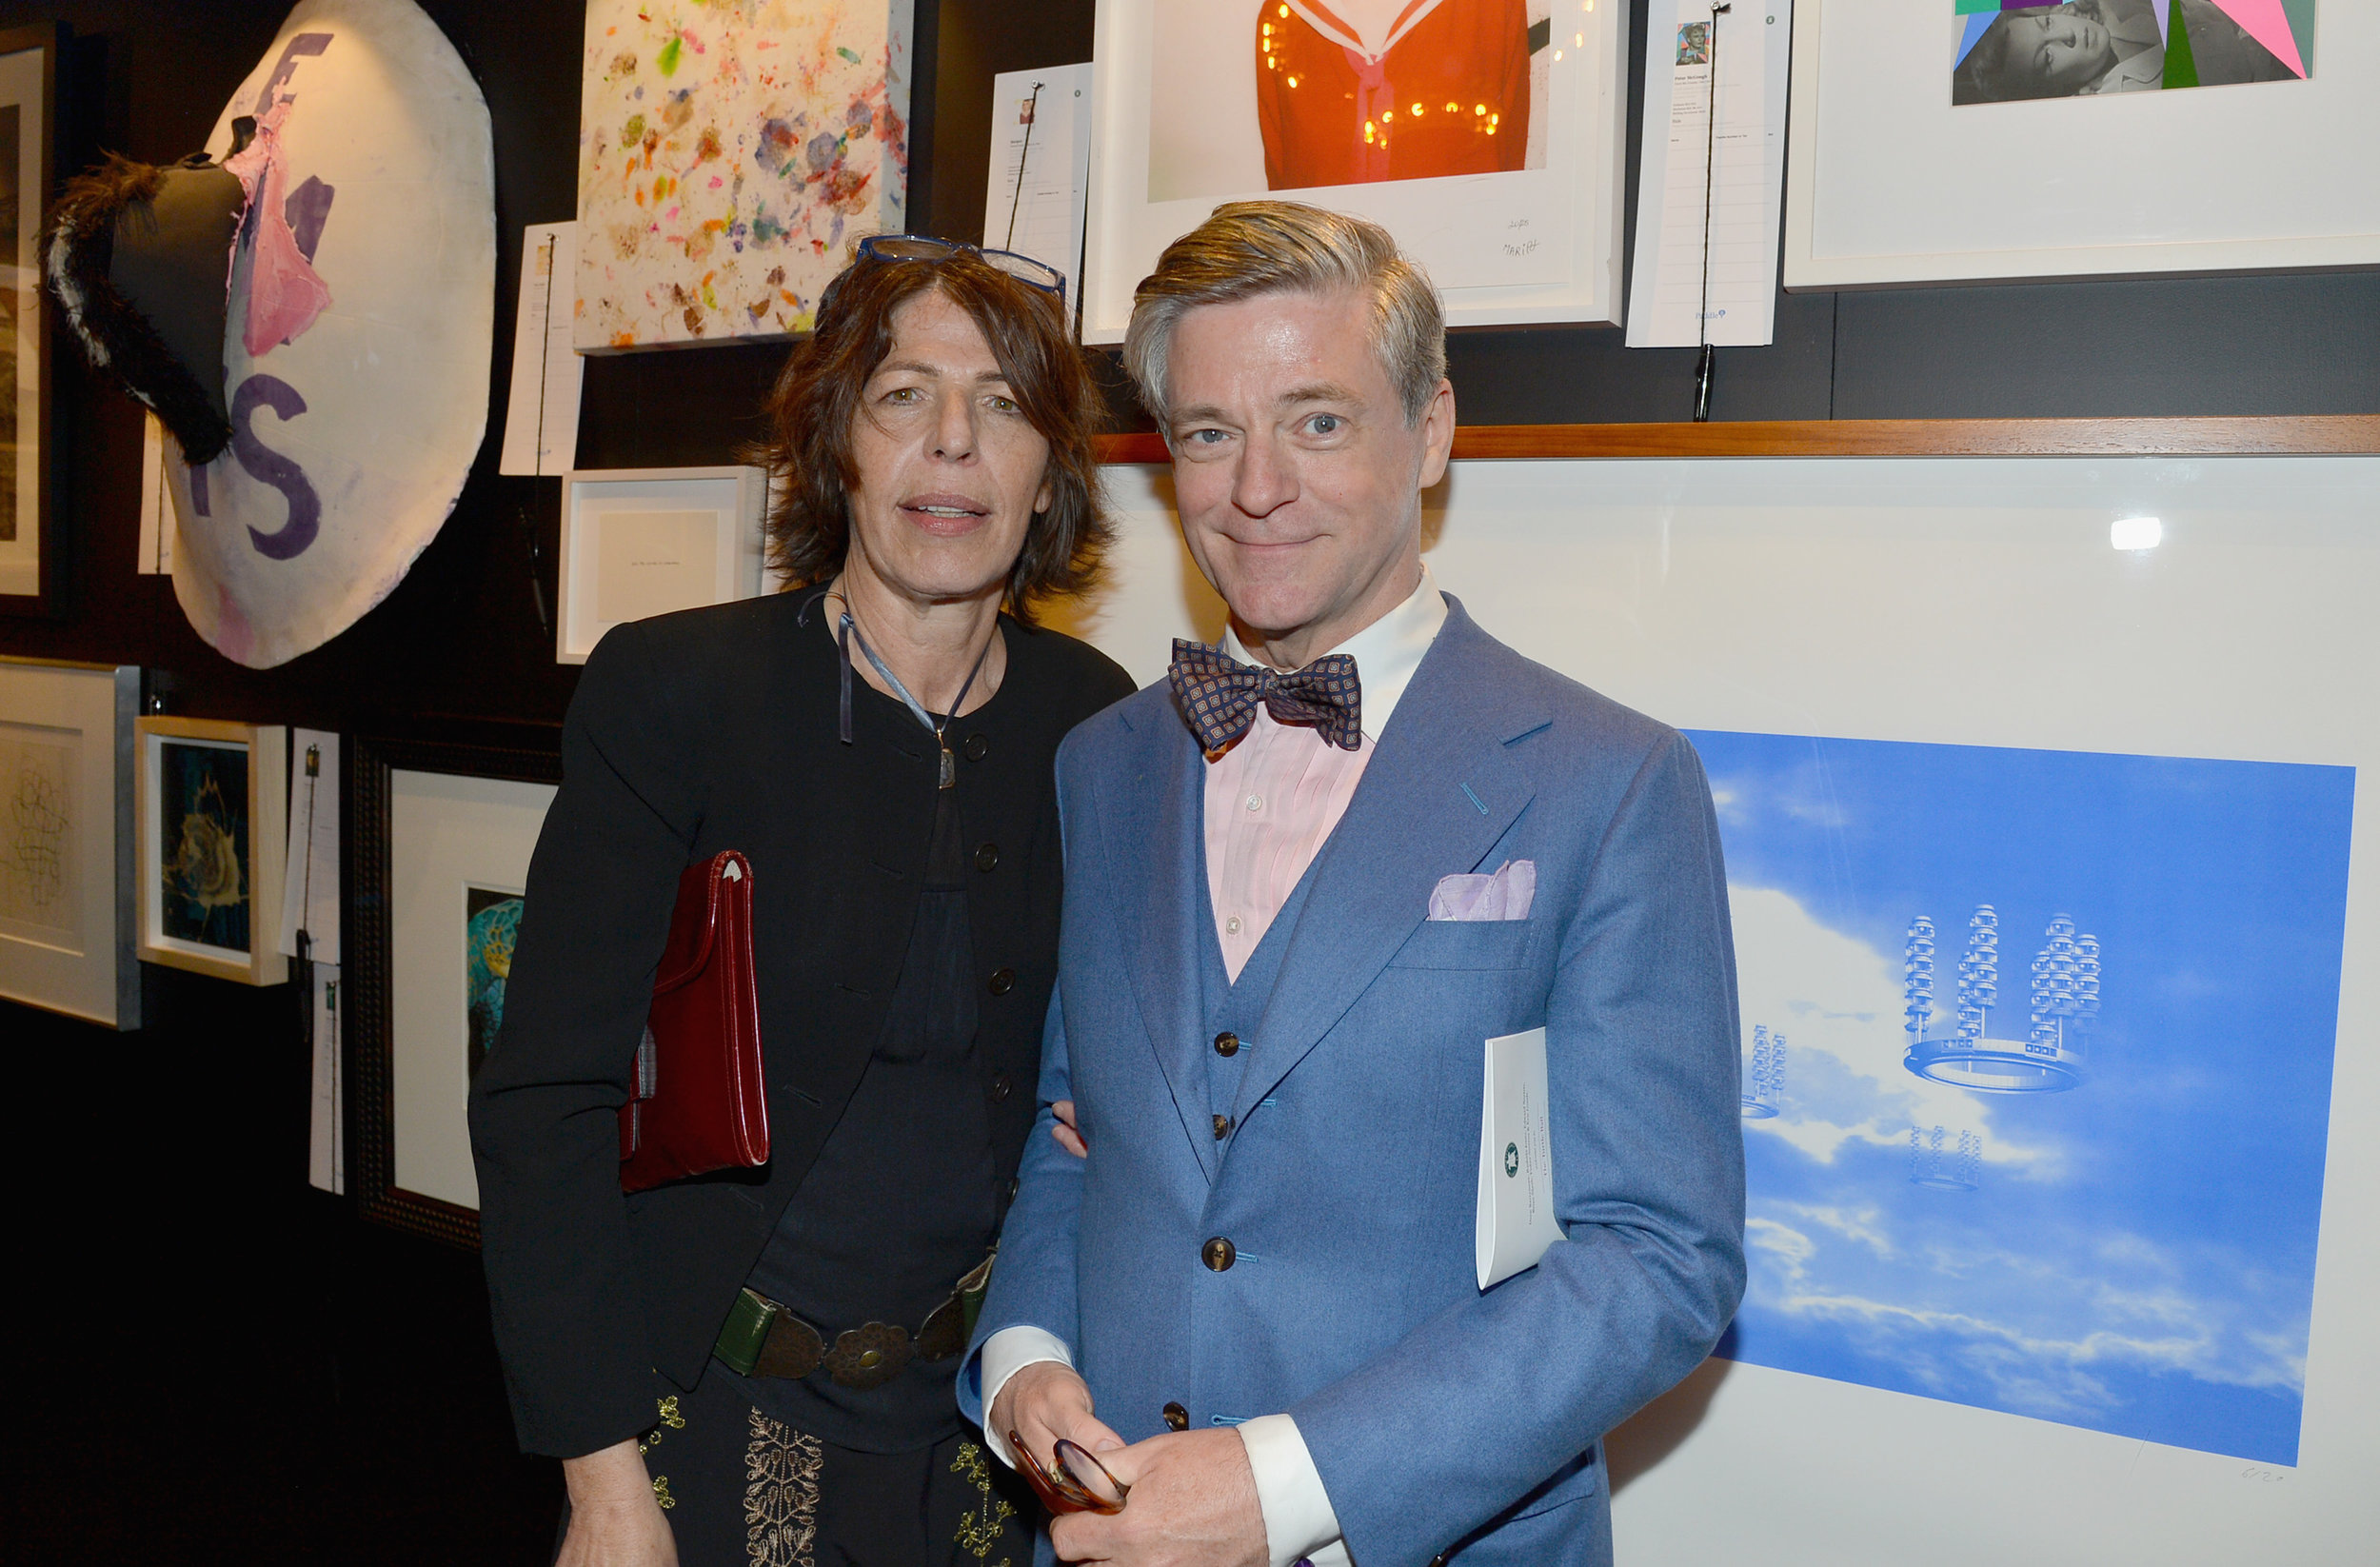 Lisa Rosen and Peter McGough